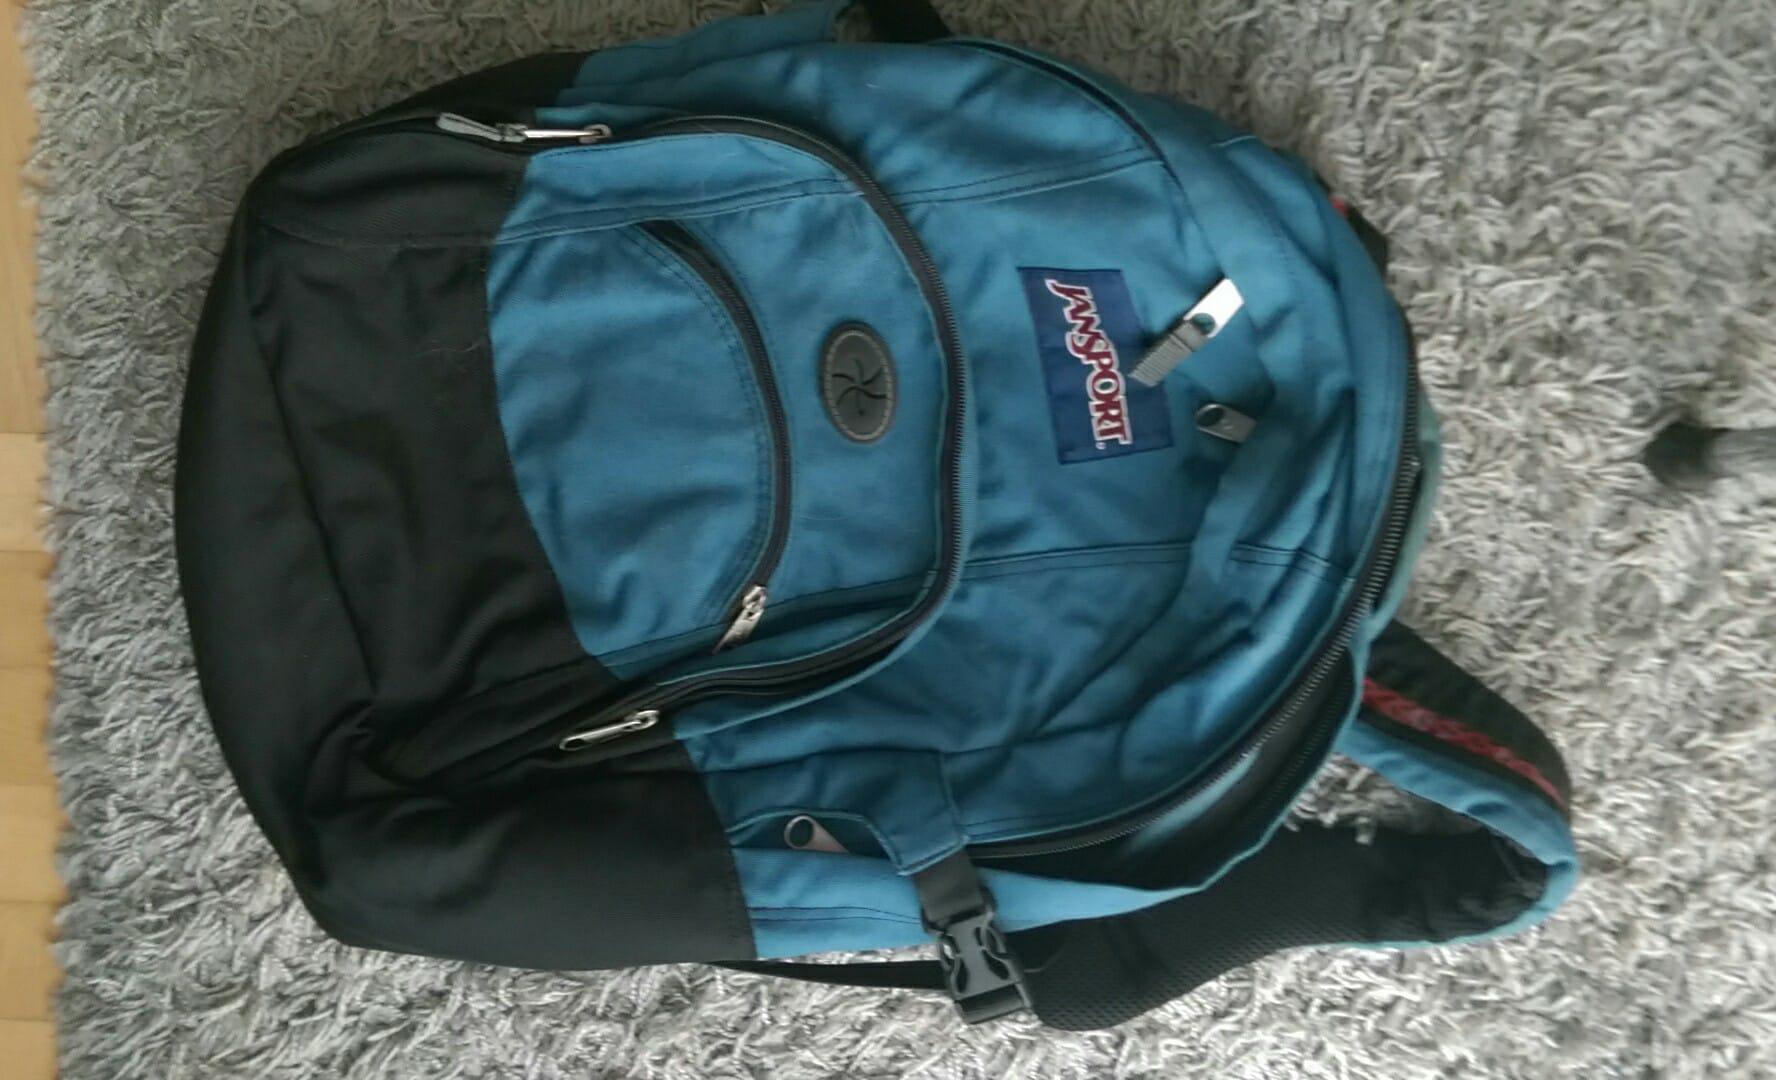 79054dc25a166 Plecak Jansport - z miejscem na laptopa - 7395302099 - oficjalne ...